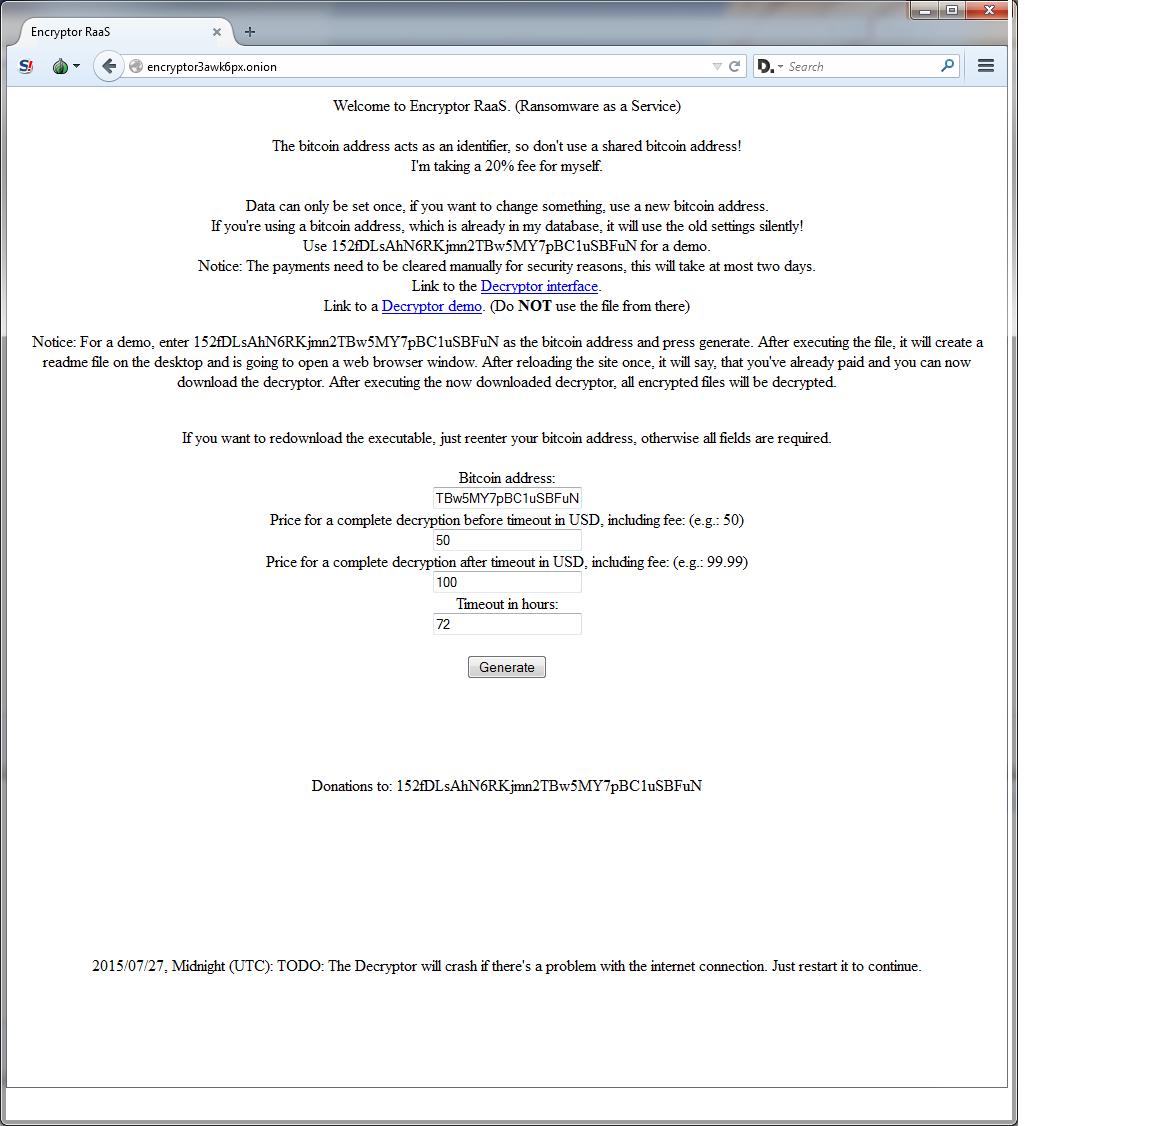 Encryptor RaaS (Ransomware as a Service) - Webroot Blog